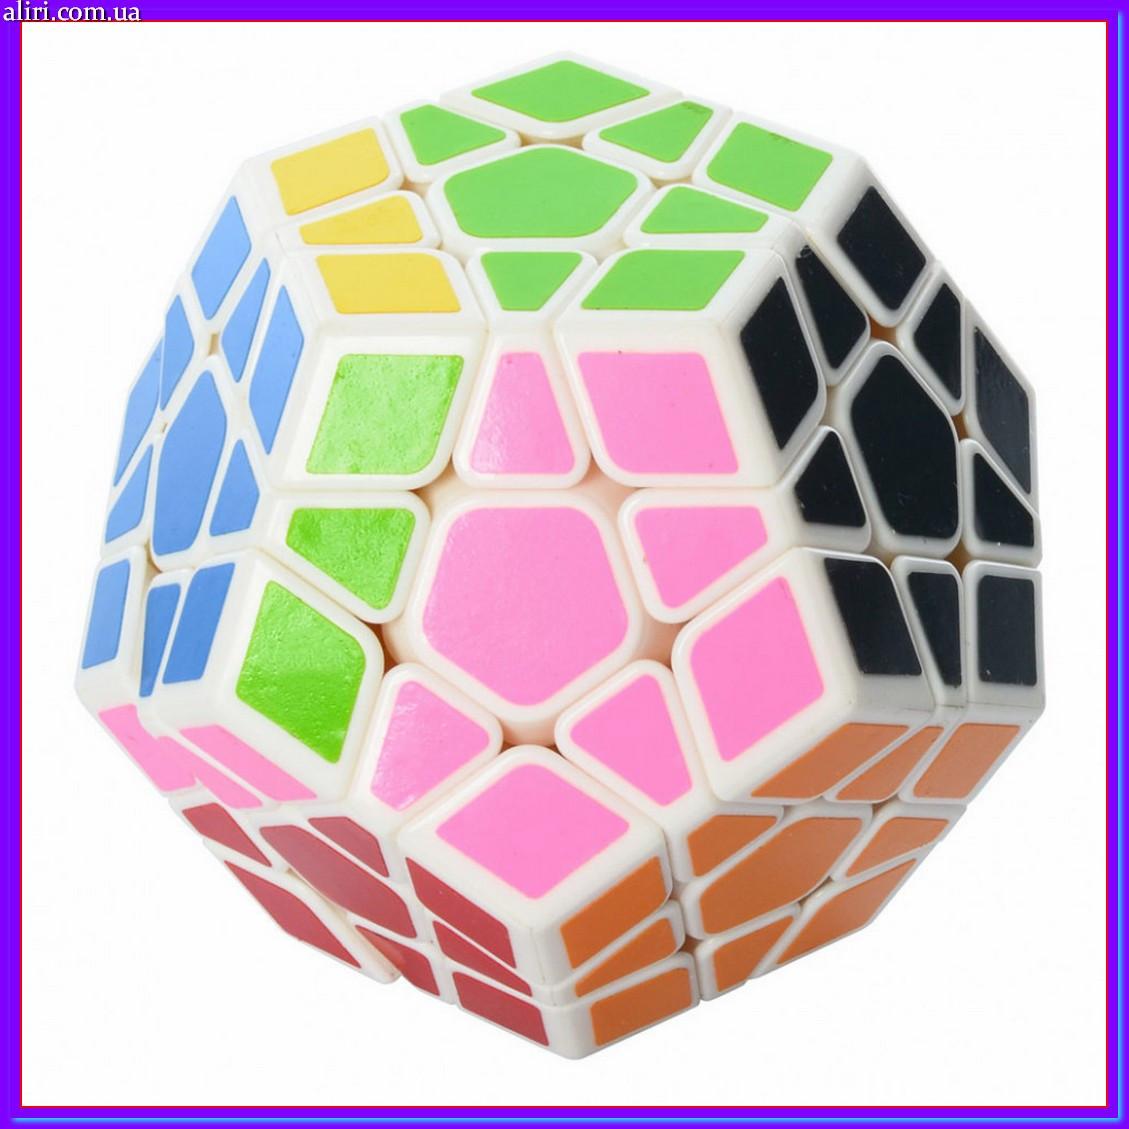 Мегаминкс Кубик Рубика 0934C-5 QiYi X-Man Megaminx (Plane White-Base) 8 см